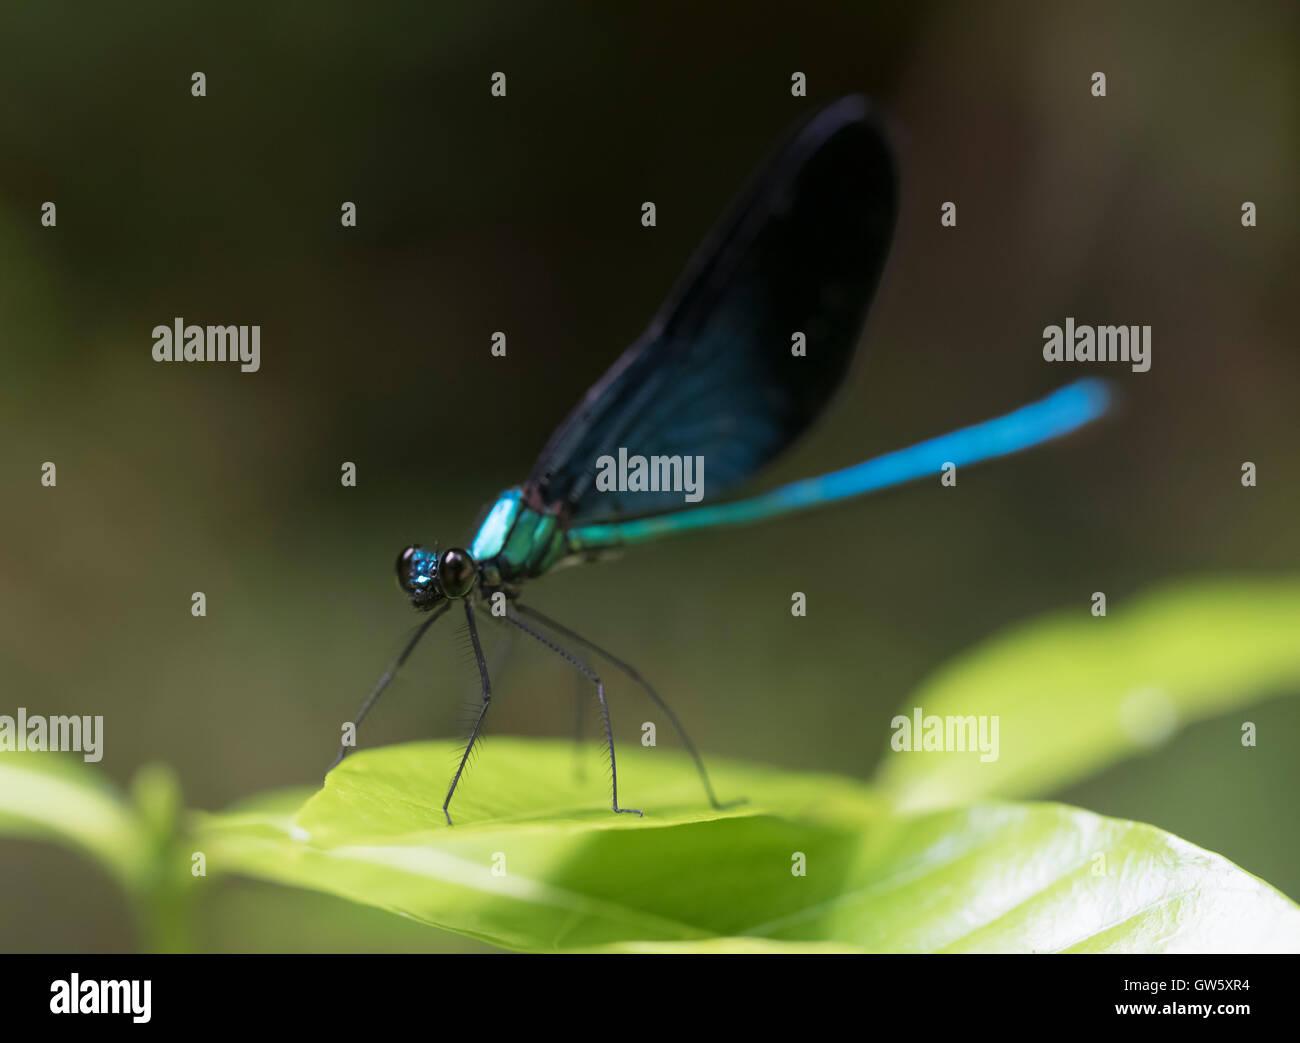 Okinawan Dragonfly, Ryukyu Islands, Okinawa, Japan - Stock Image